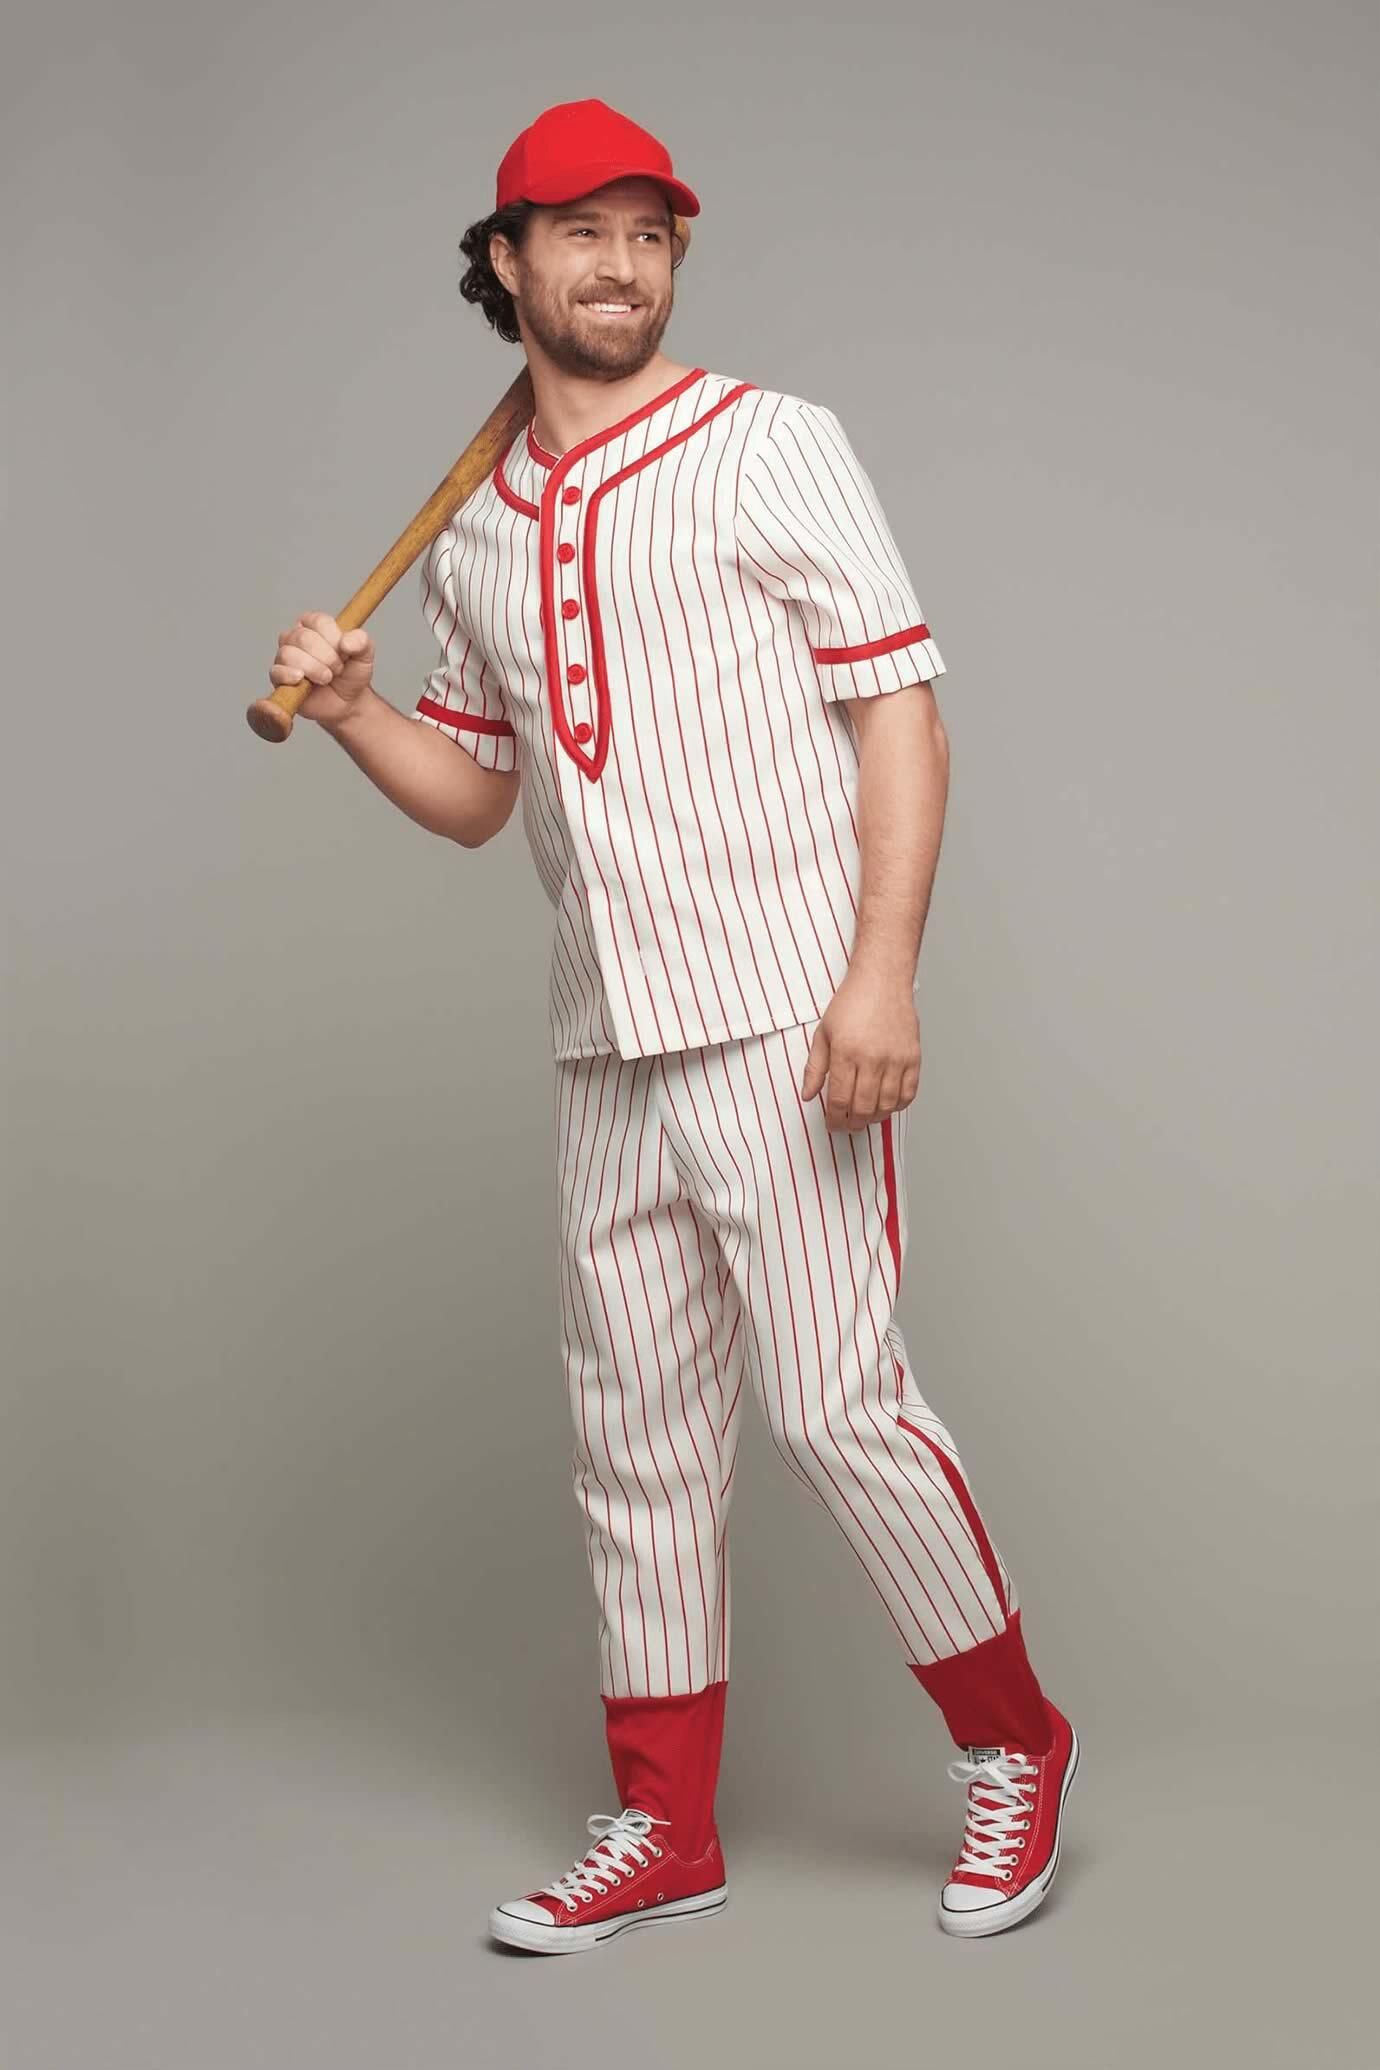 Retro Baseball Player Costume For Men Chasing Fireflies Baseball Player Costume Baseball Dress Mens Costumes